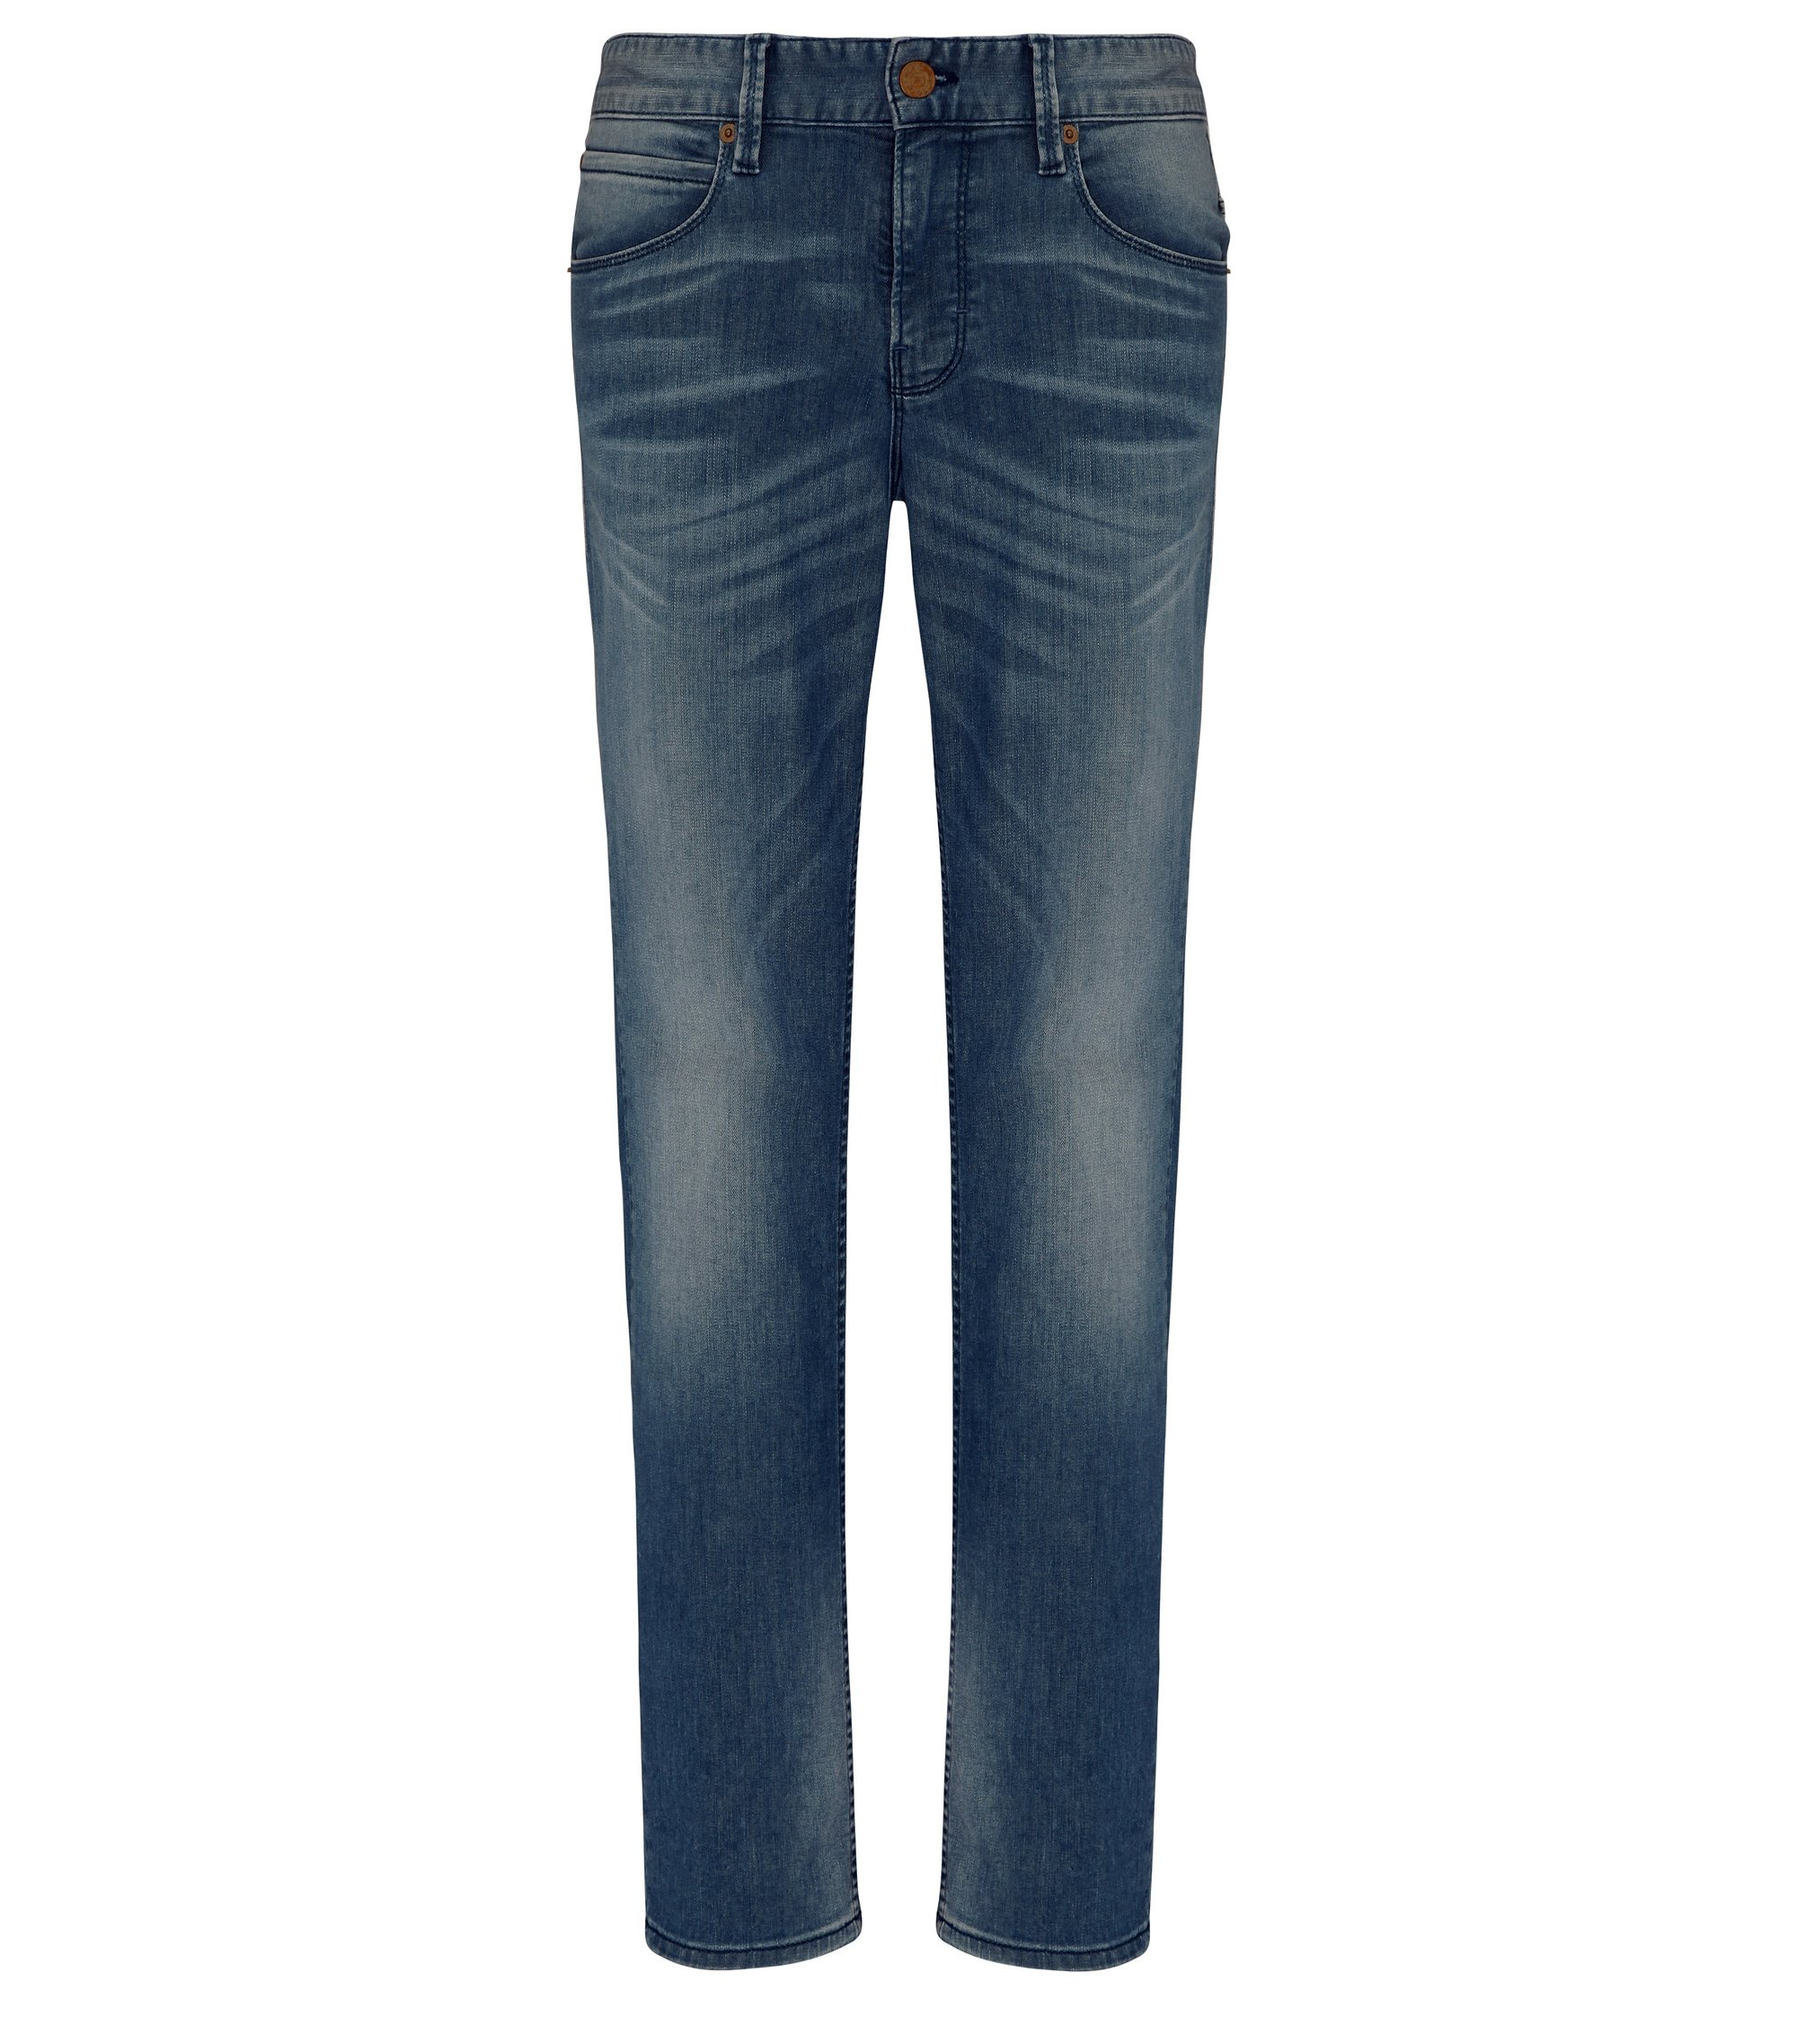 Stretch Cotton Blend Jean, Slim Fit | Orange63, Blue